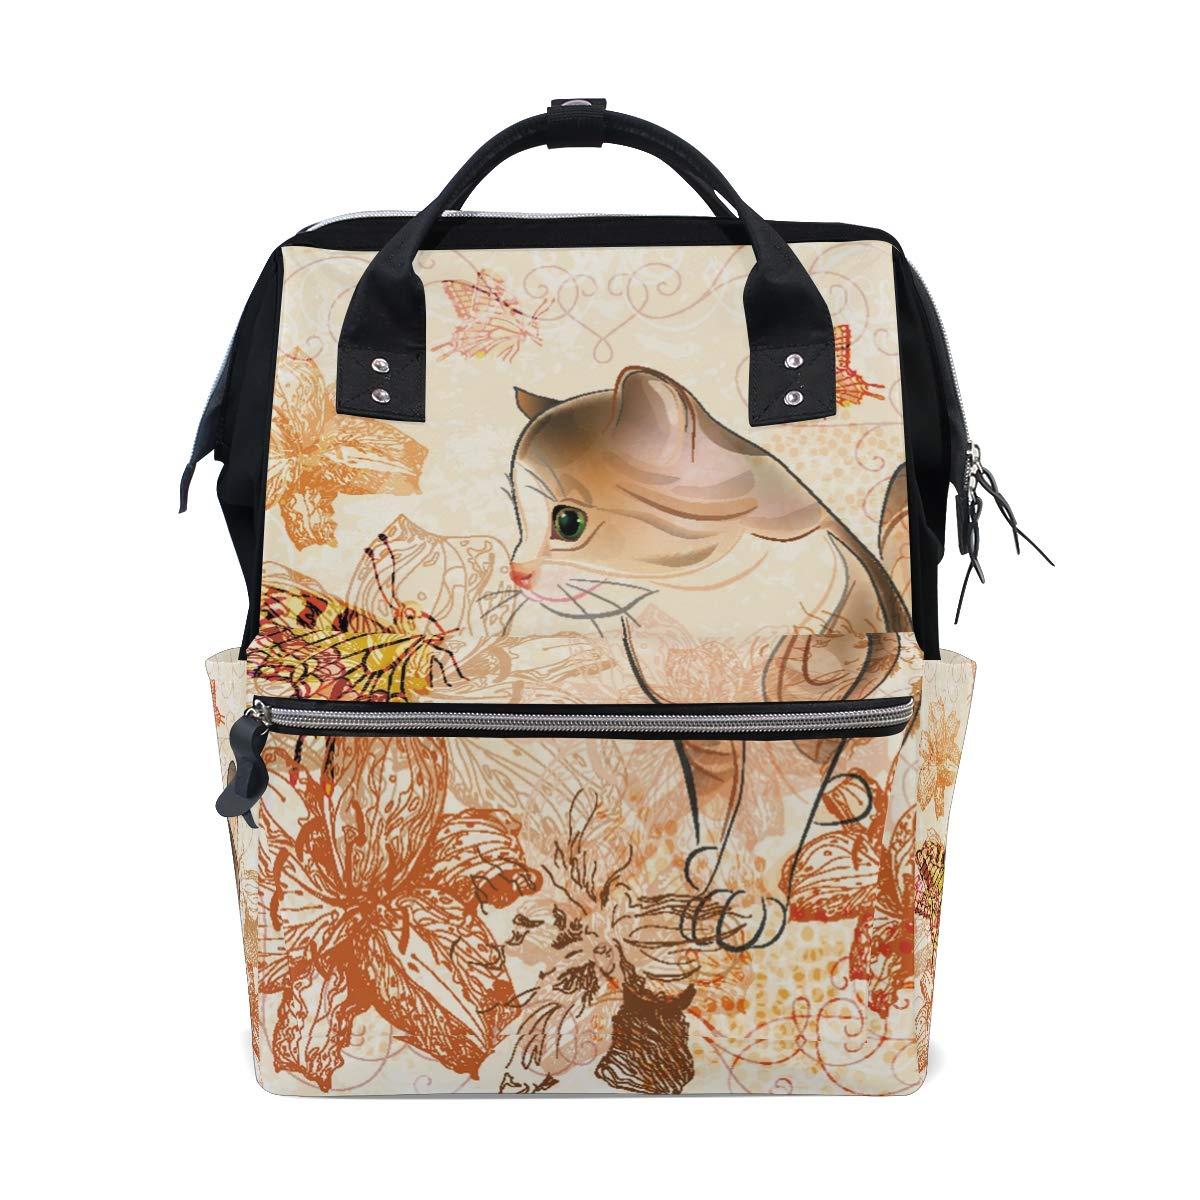 MERRYSUGAR Diaper Bag Backpack Cute Cat Flower Floral Multifunction Travel Bag